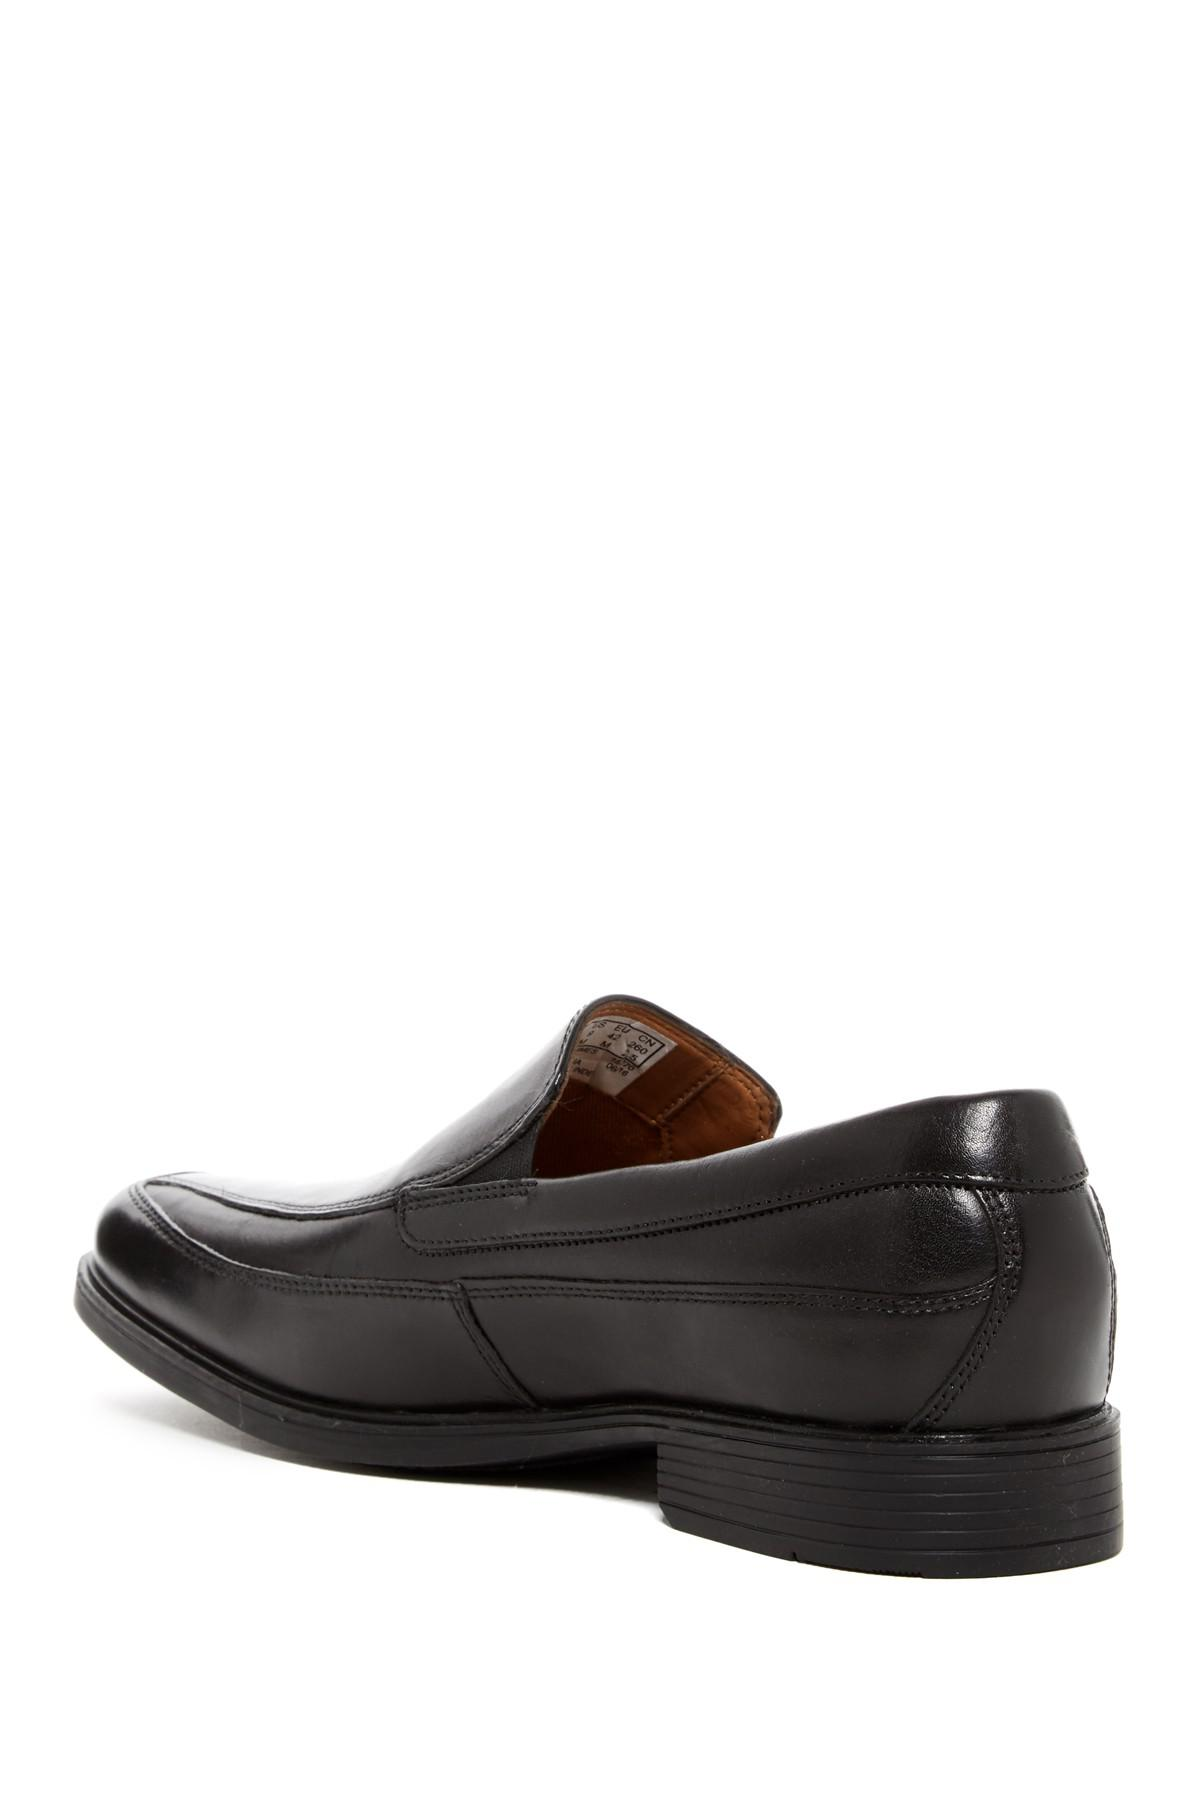 8edd125865f Clarks. Men s Black Tilden Free Leather Slip-on Loafer - Wide Width  Available